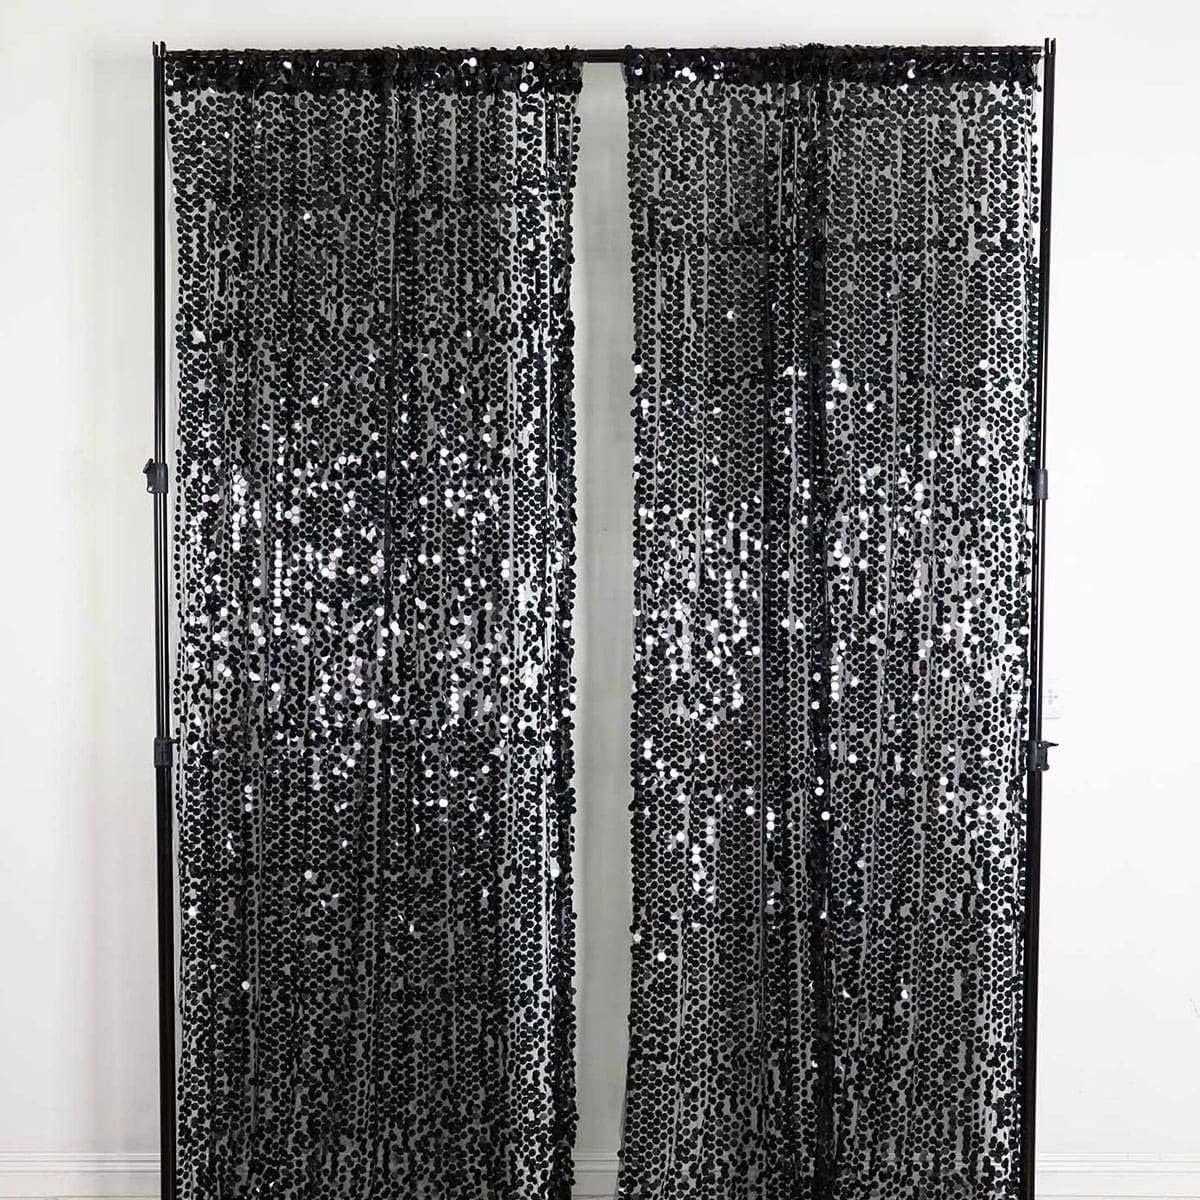 Efavormart 2 Panels Black Big Payette Sequin Room Darkening Window Treatment Panel Drapes with Rod Pockets 52 Wx108 L